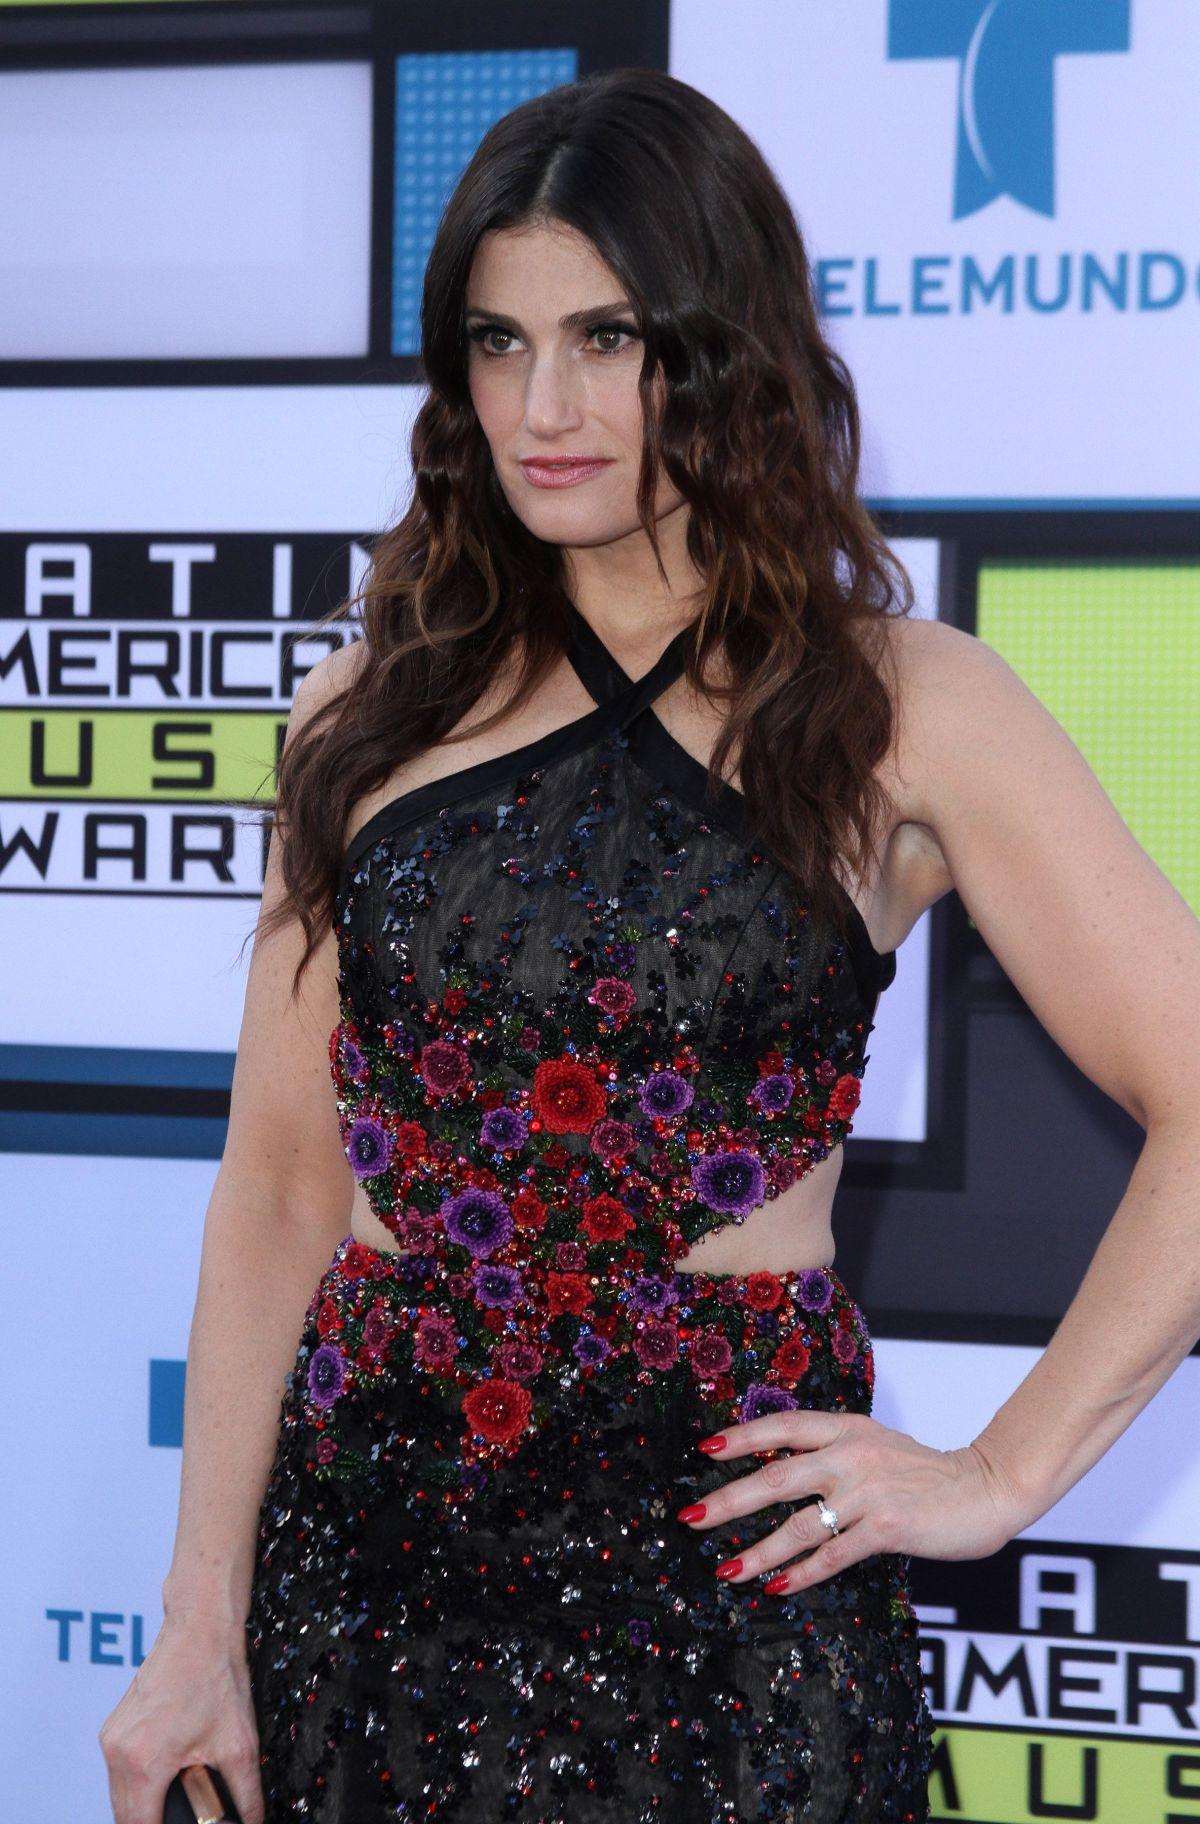 IDINA MENZEL at 2016 Latin American Music Awards in Hollywood 10/06/2016